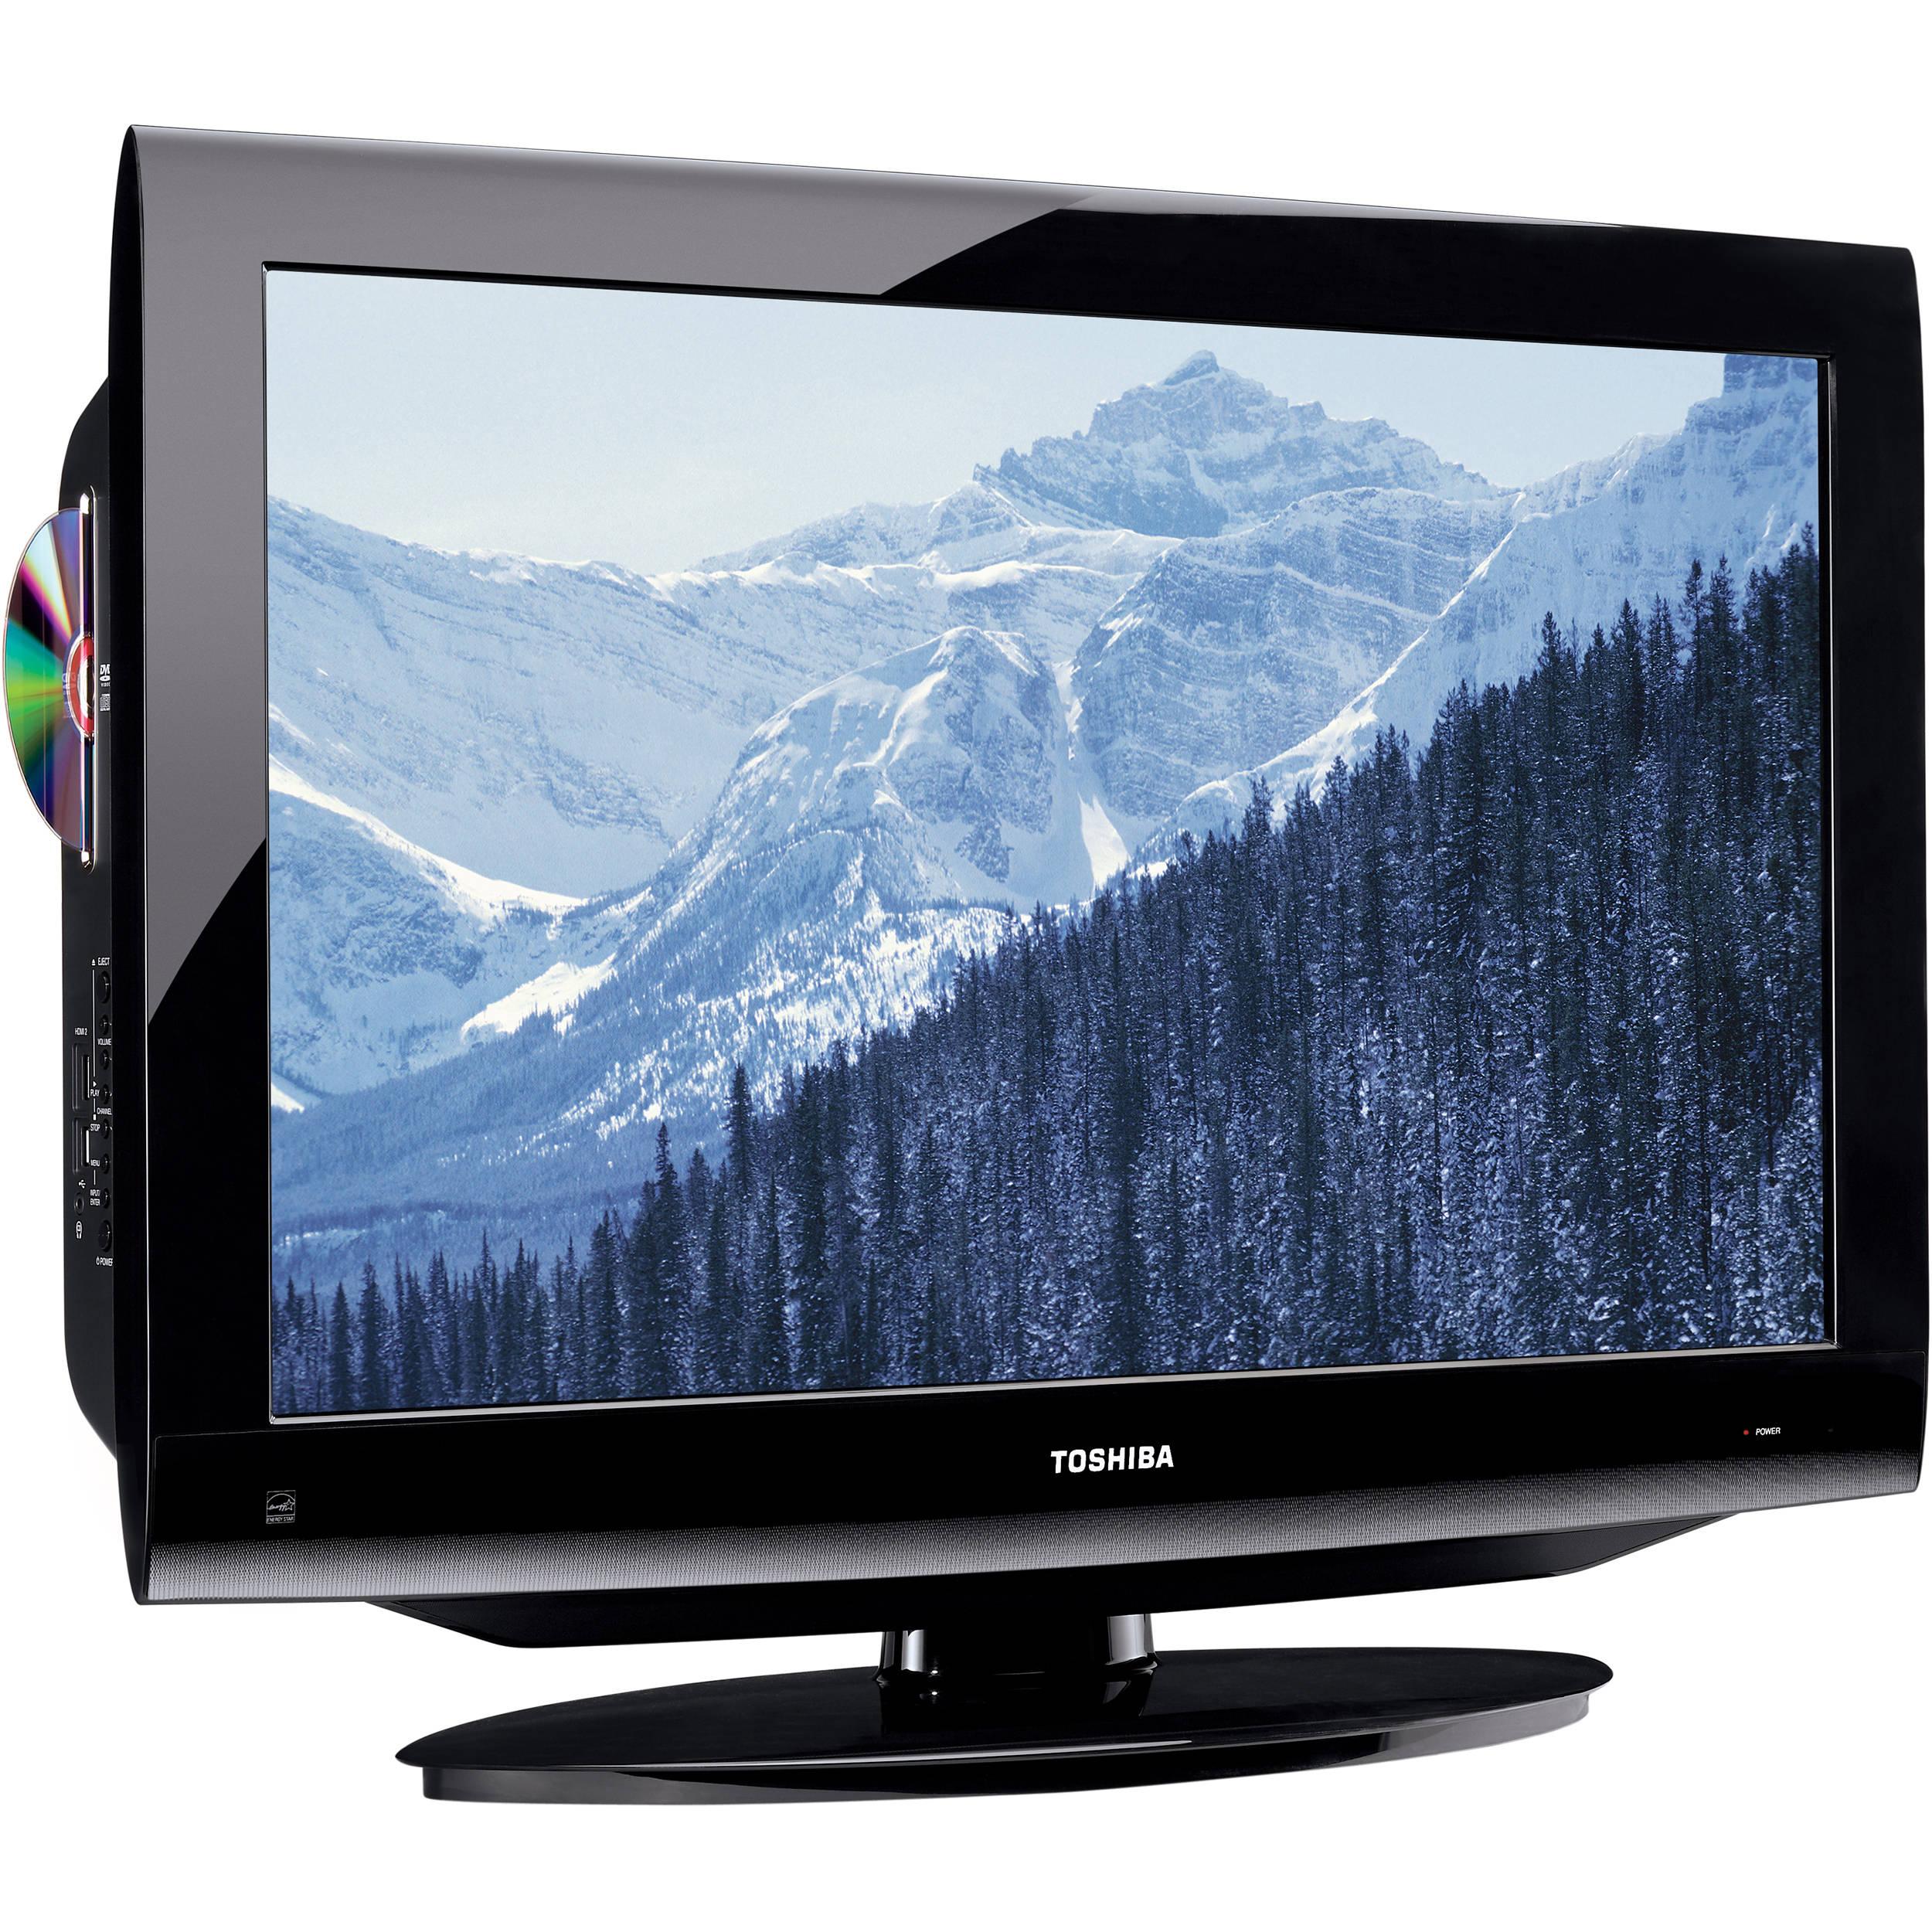 toshiba 32cv100u 32 720p lcd hdtv dvd combo 32cv100u b h. Black Bedroom Furniture Sets. Home Design Ideas